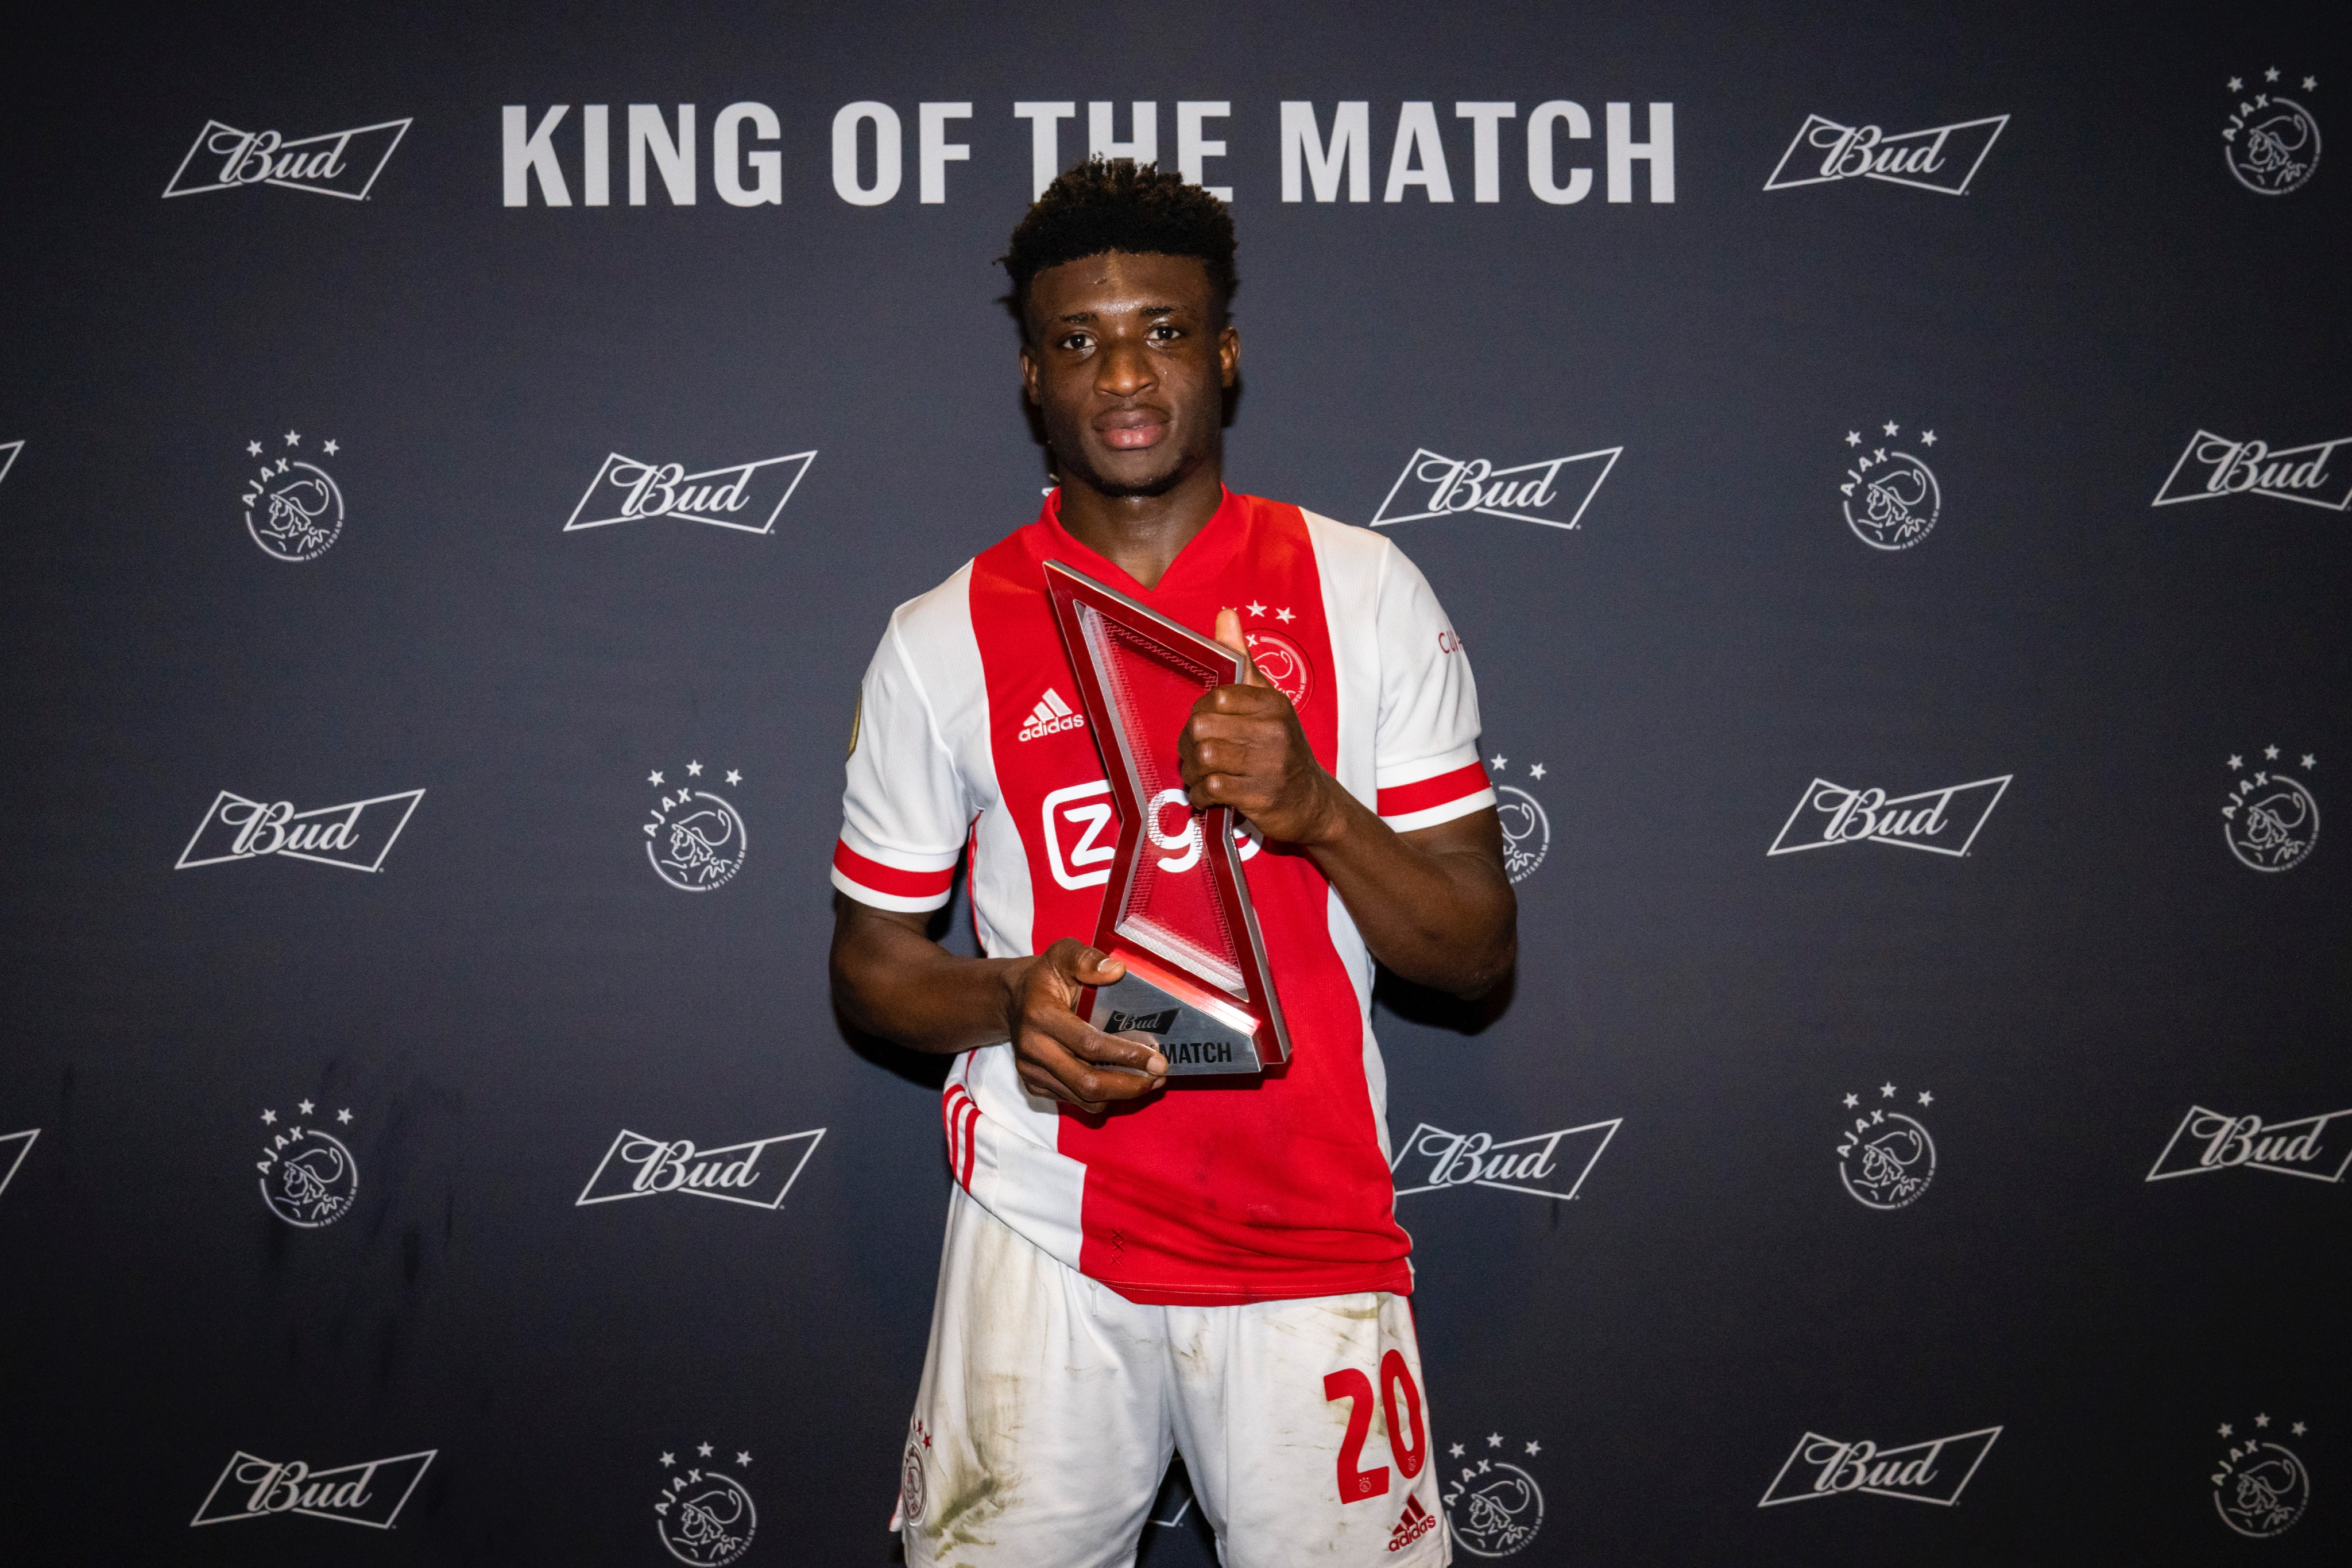 Mohammed Kudus earns MVP award after scintillating performance against SC Heerenveen